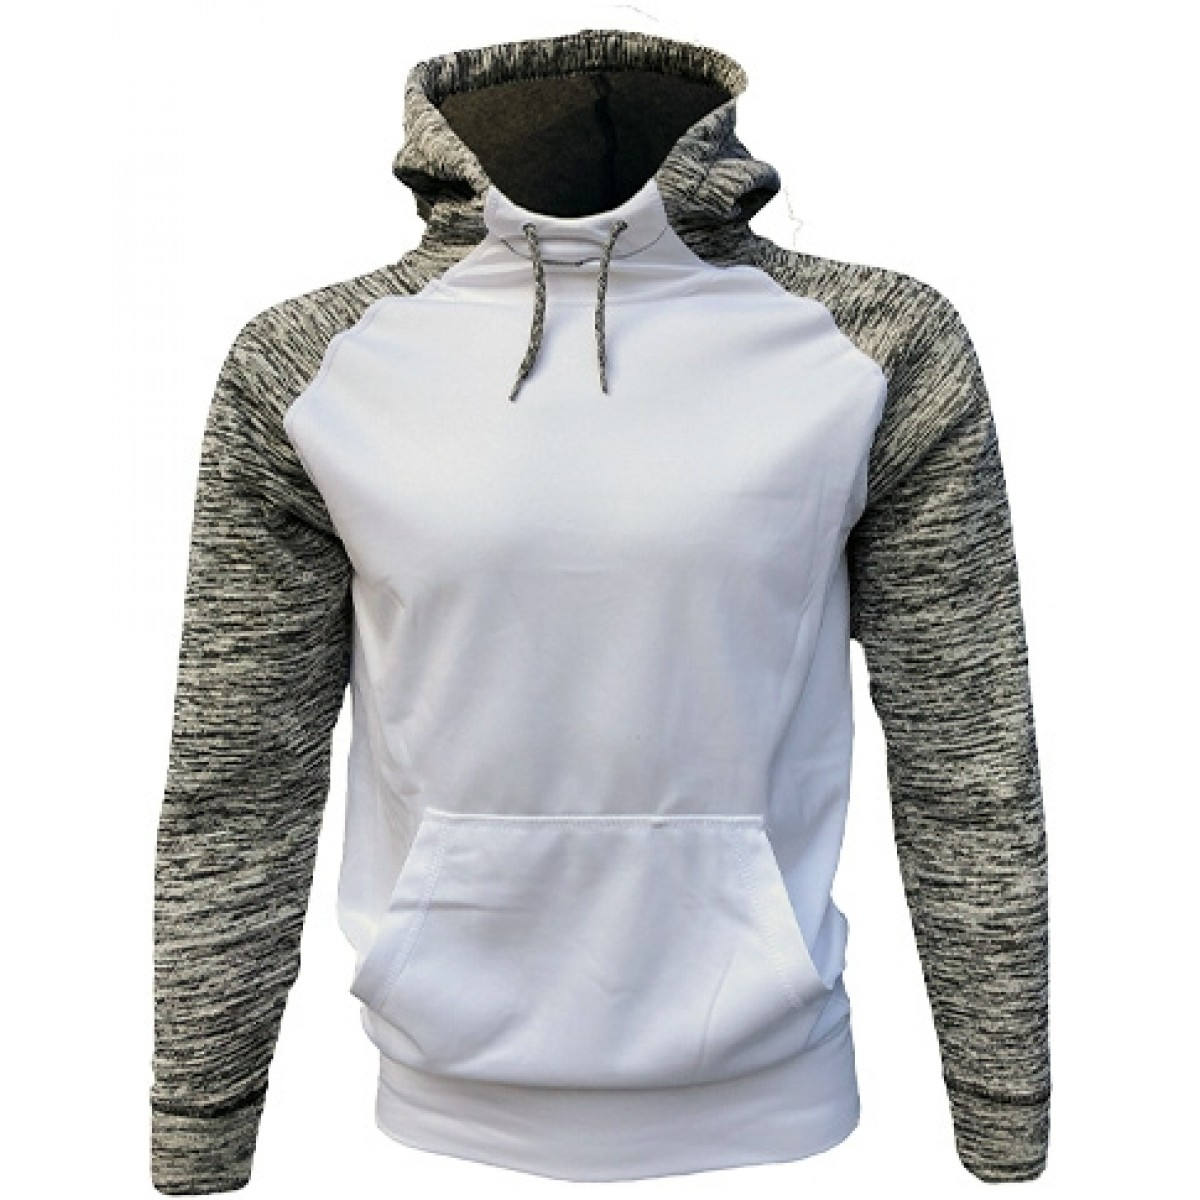 White/Gray Performance Hoodie